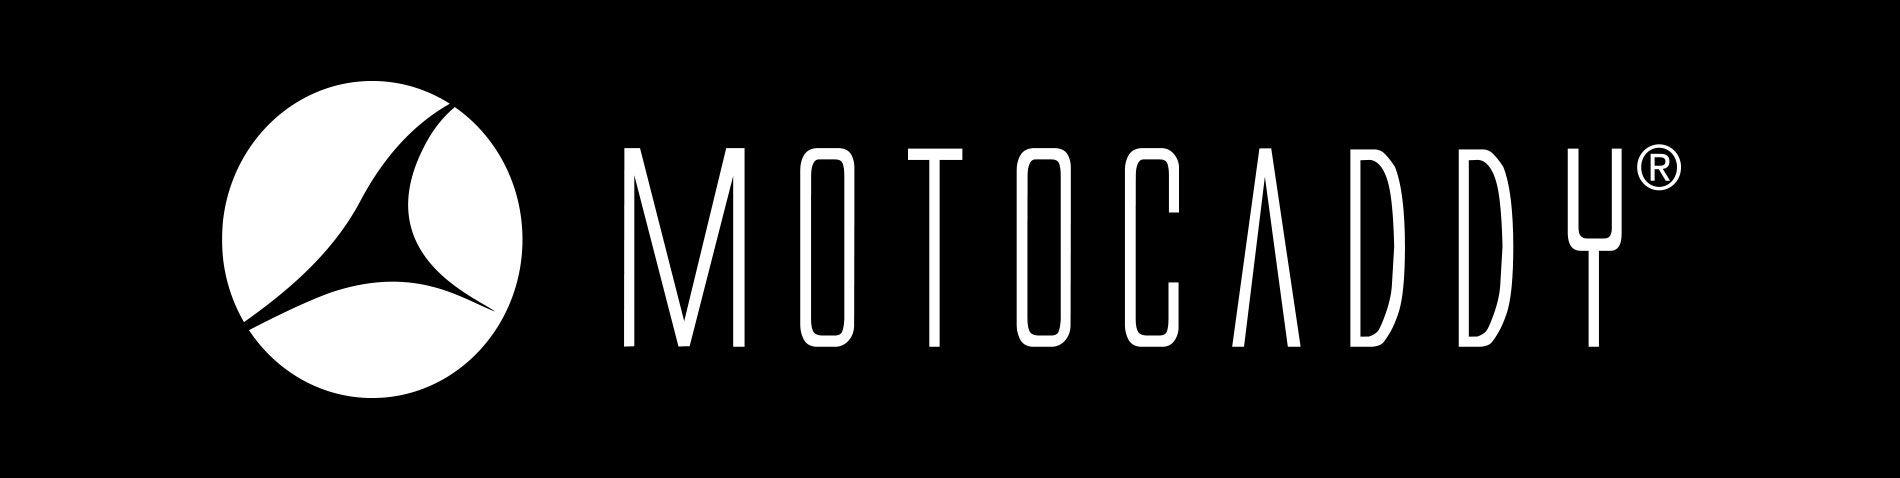 Motocaddy Header